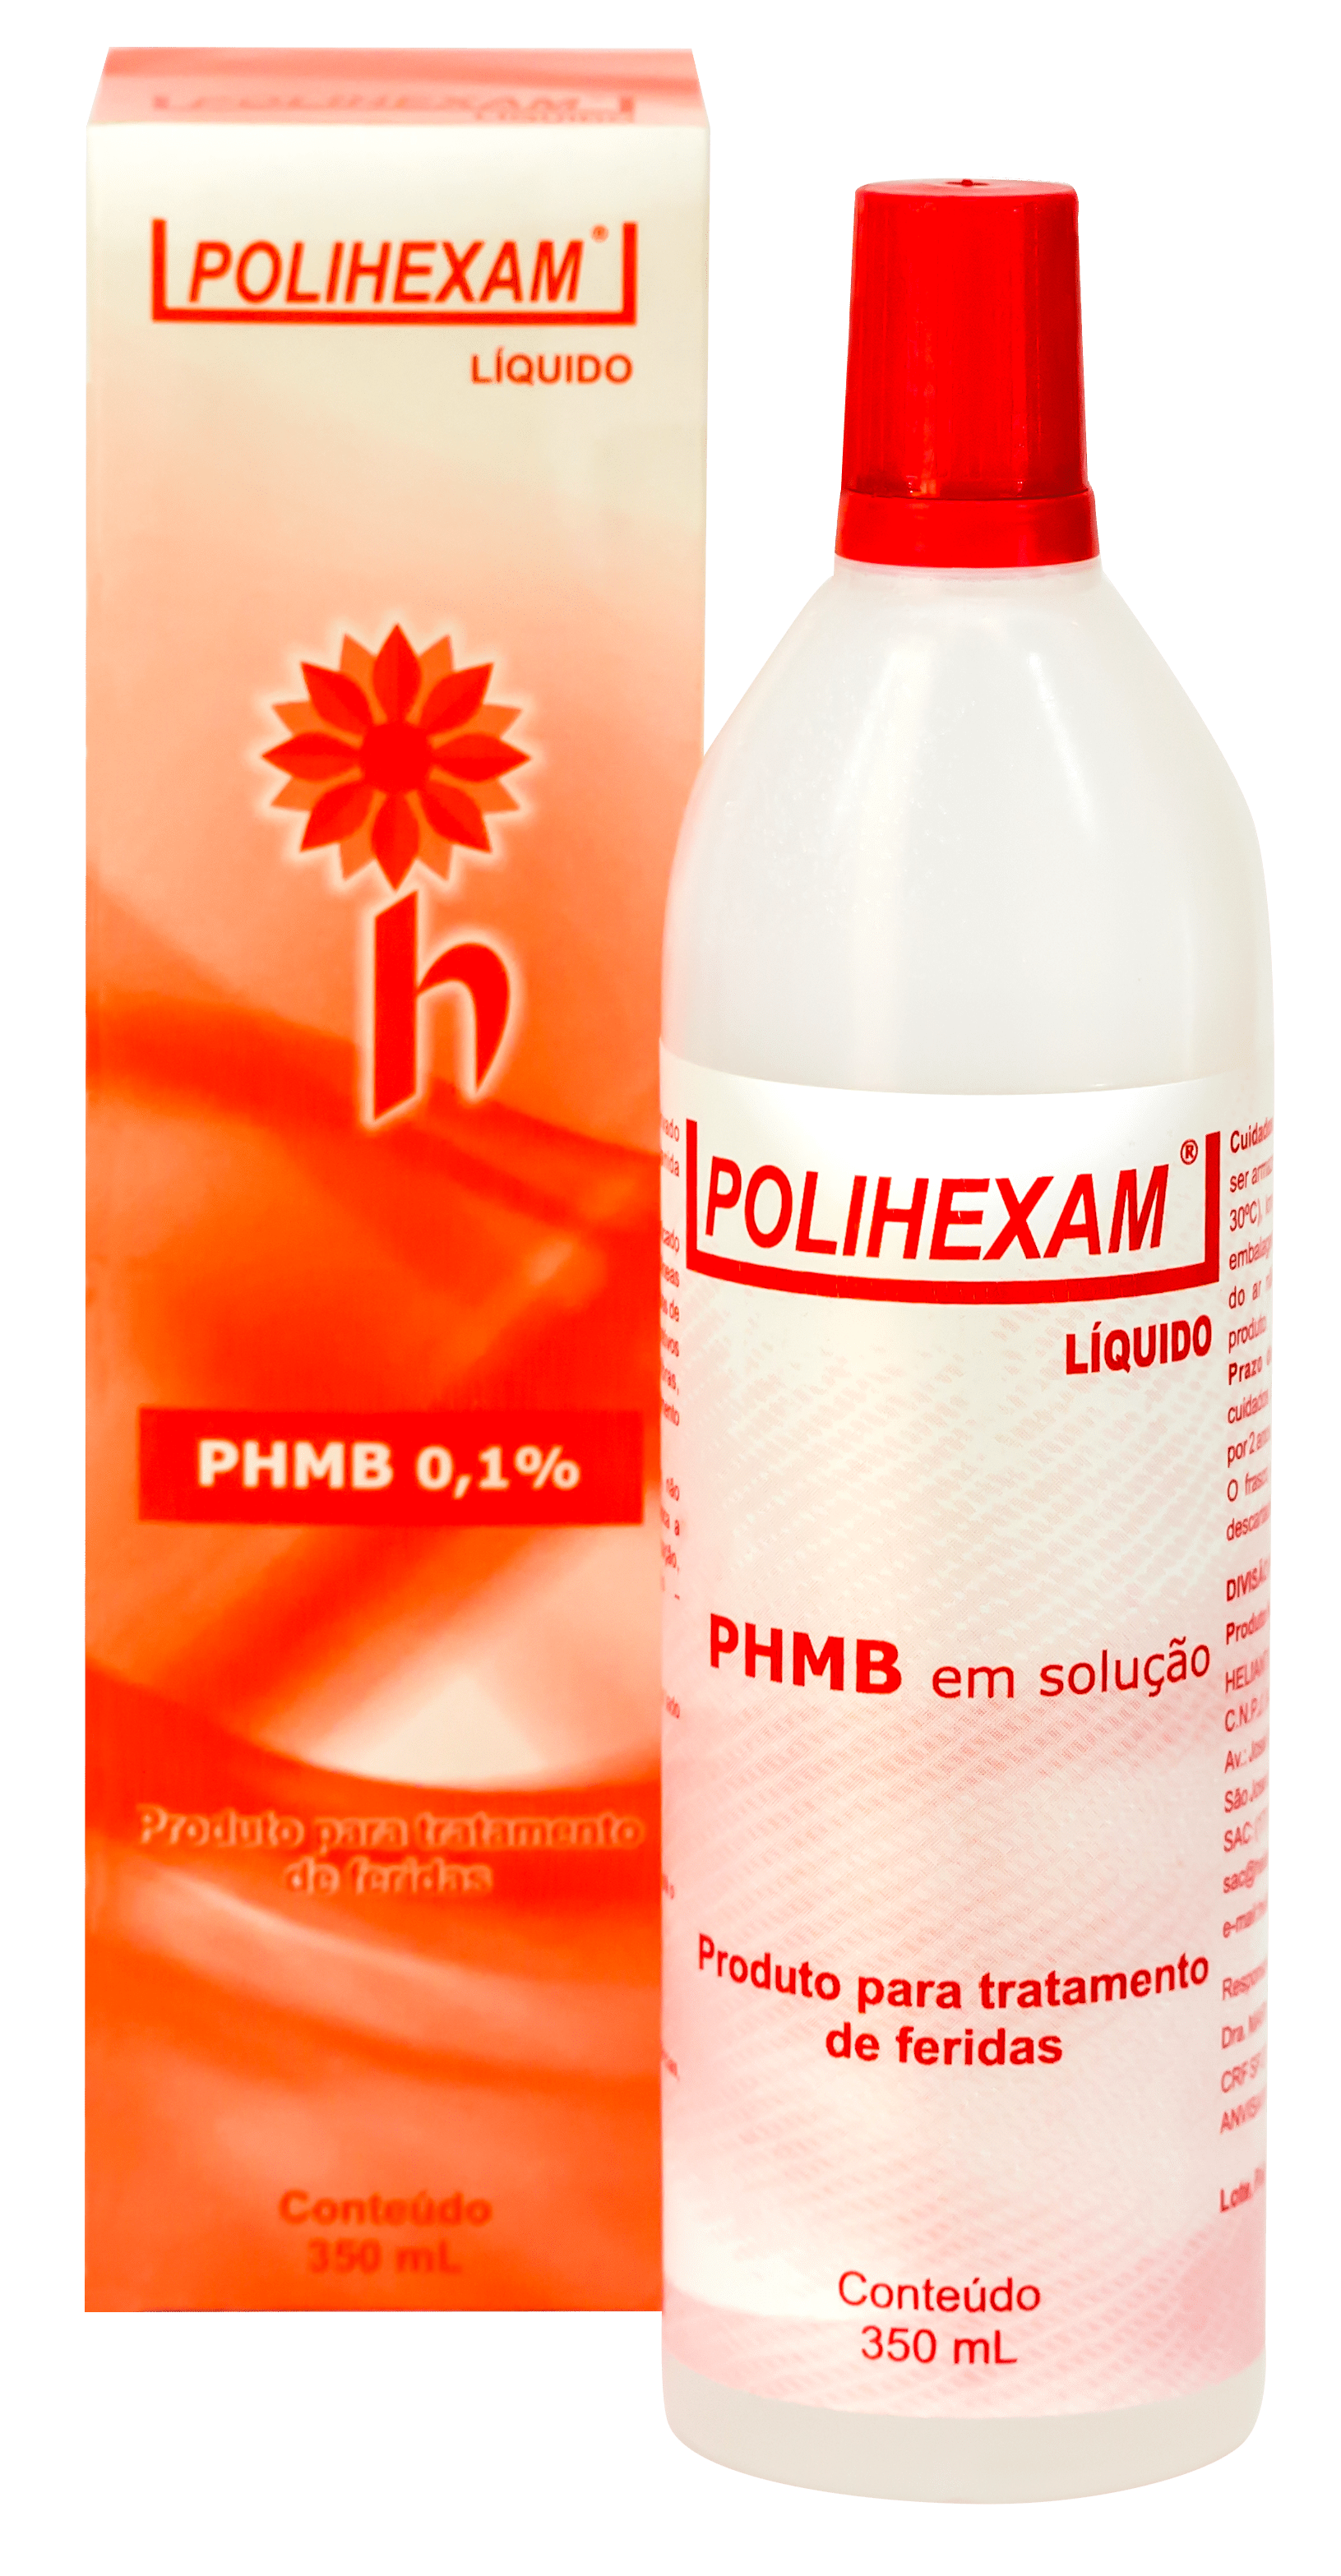 Polihexam Líquido Image